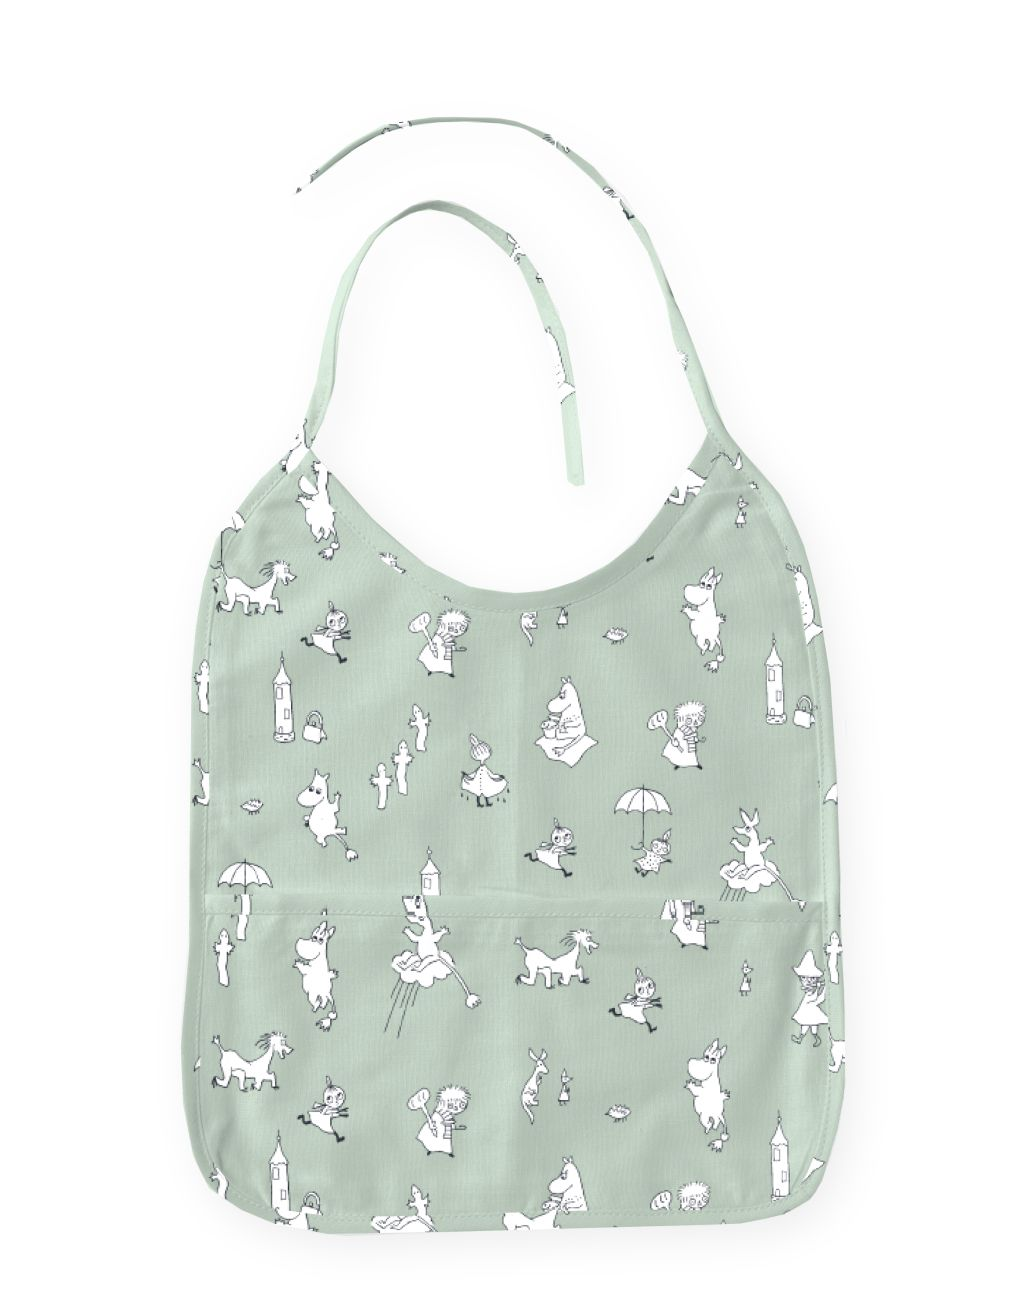 Finlayson Moomin Friends Bib Oilcloth Fabric